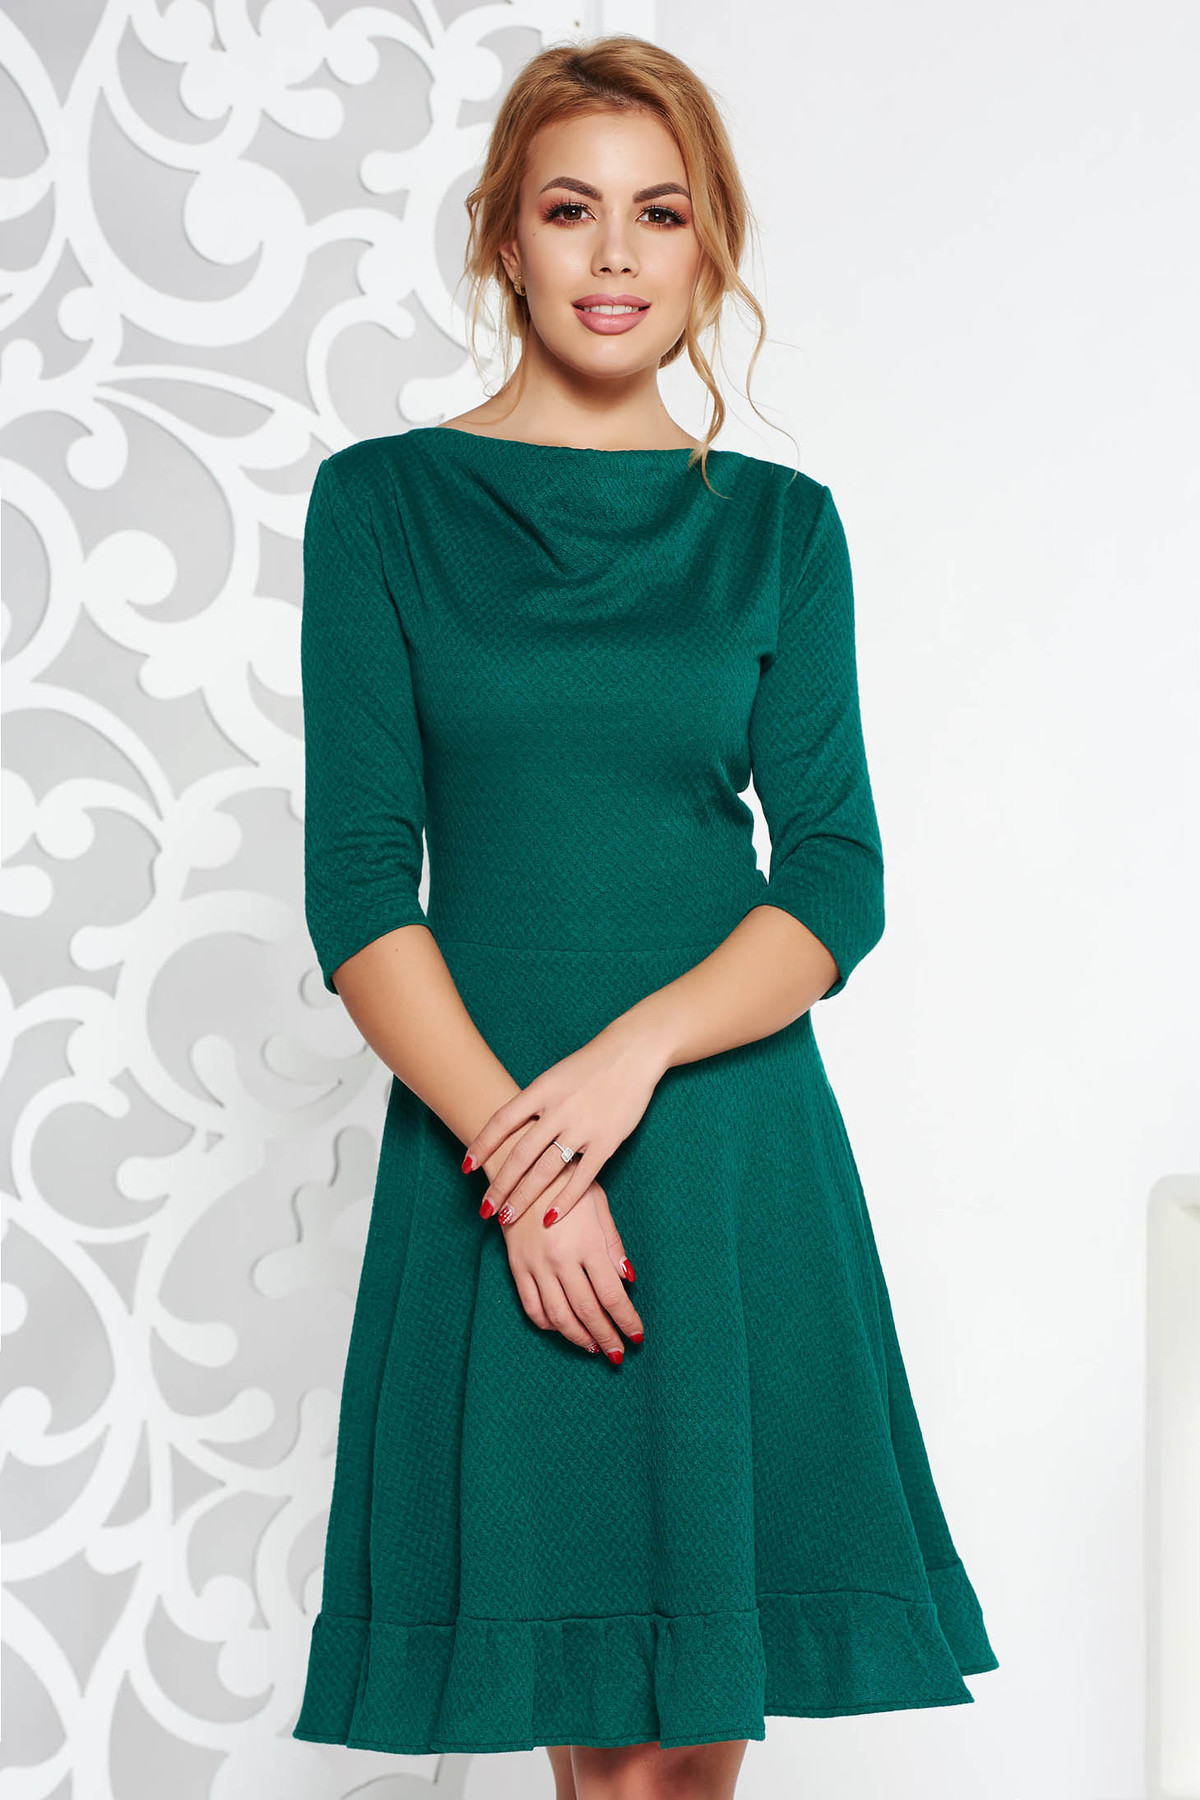 Rochie StarShinerS verde office midi in clos din material elastic cu maneci trei-sferturi